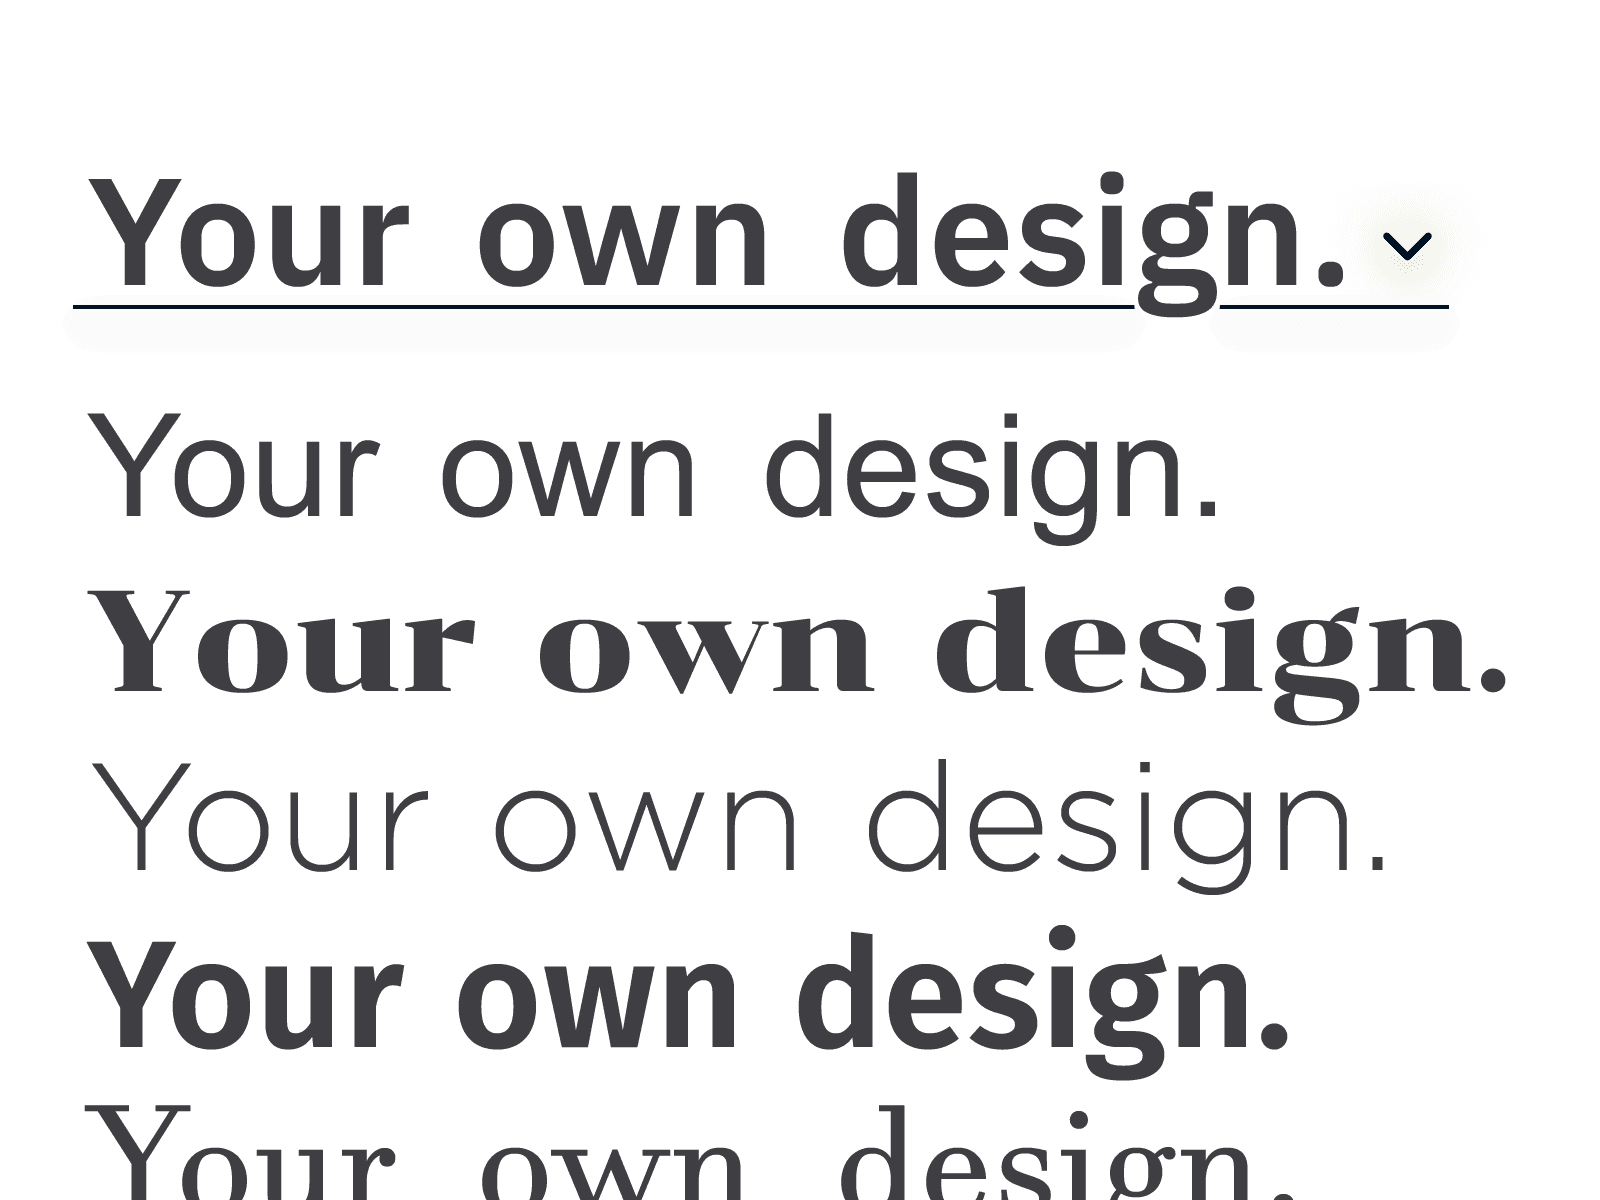 beetheme your own design